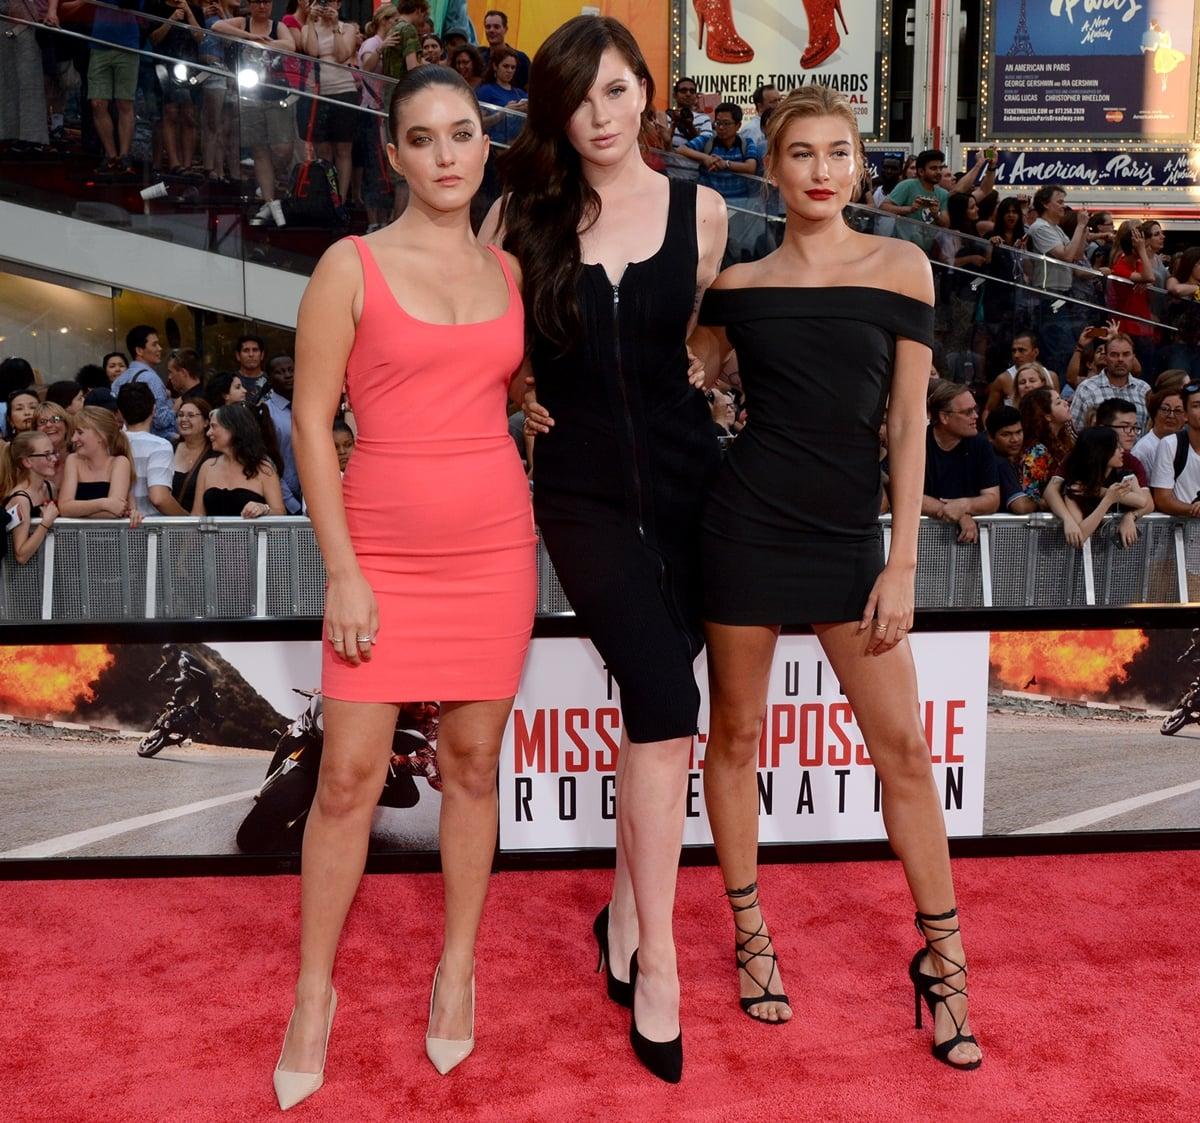 Hailey Bieber is shorter than her tall cousin Ireland and her sister Alaia Baldwin